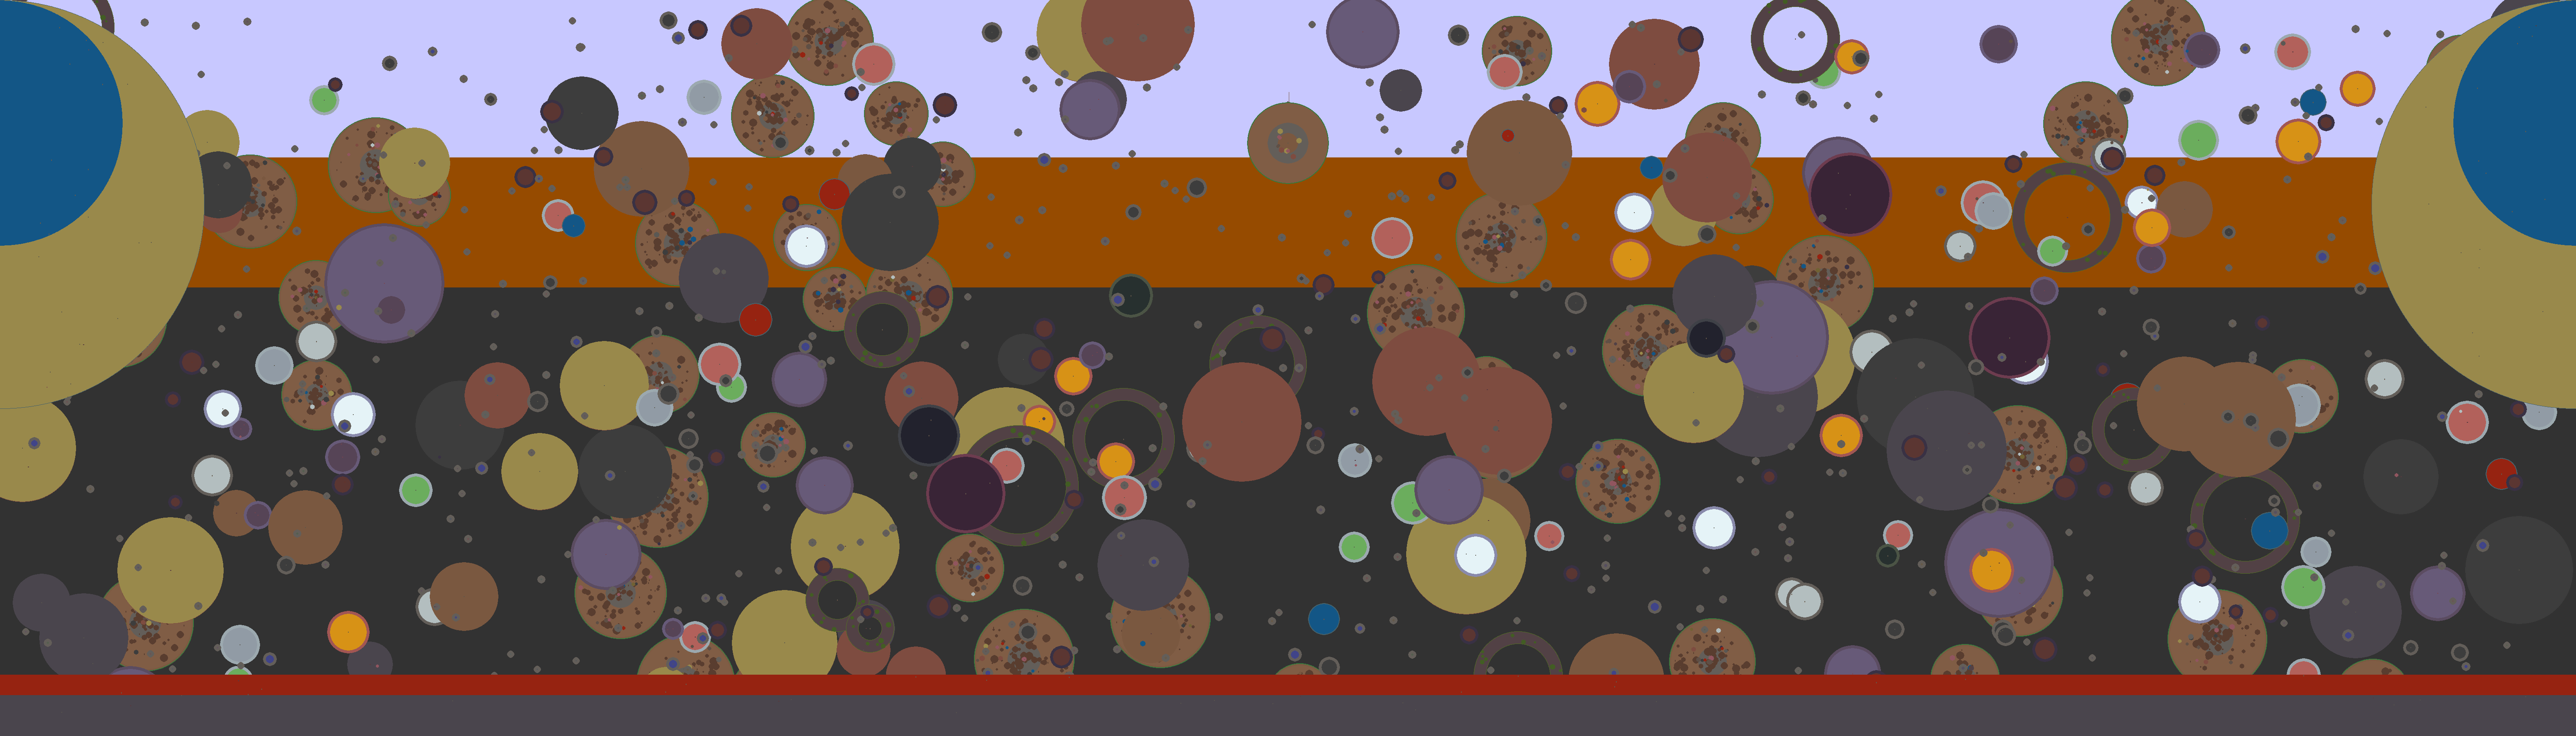 planetoids medium.png